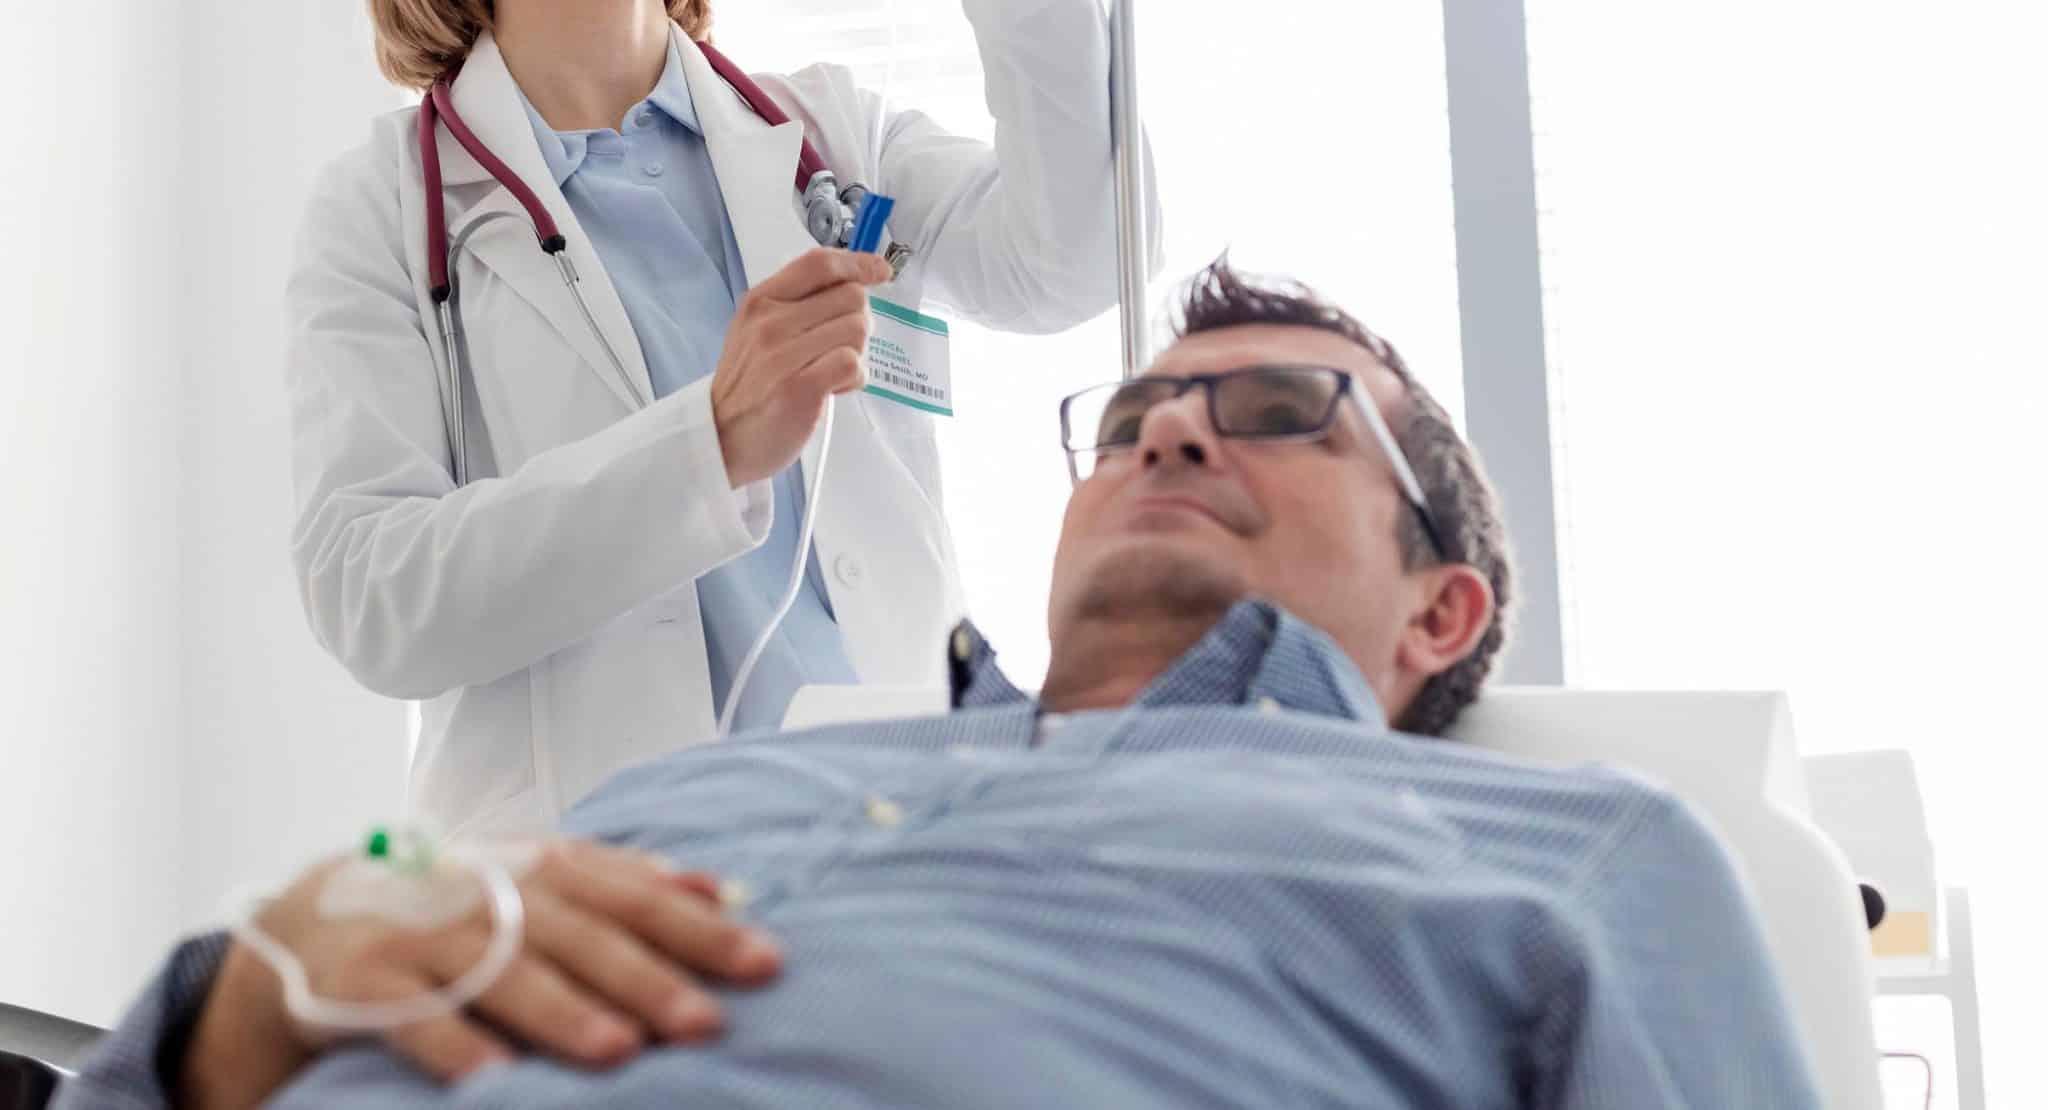 Adjusting IV Drip for Ketamine